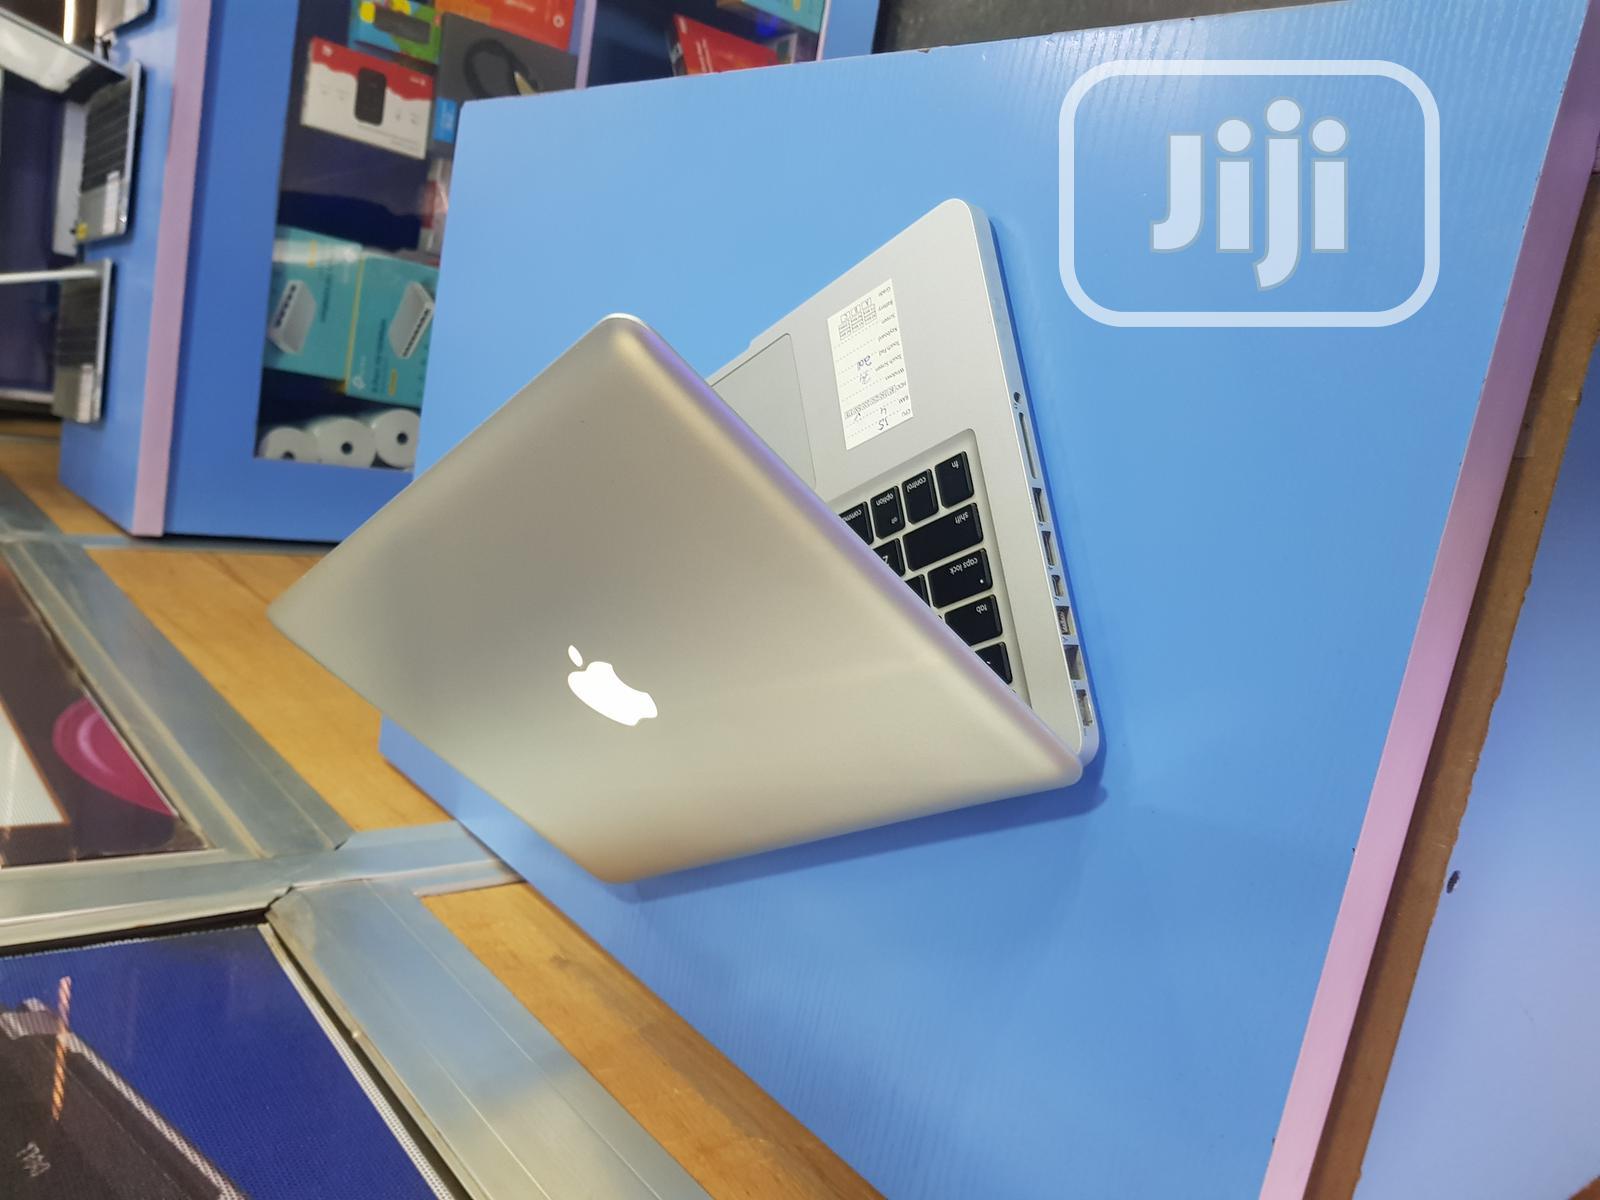 Laptop Apple MacBook Pro 4GB Intel Core i5 HDD 500GB | Laptops & Computers for sale in Enugu / Enugu, Enugu State, Nigeria